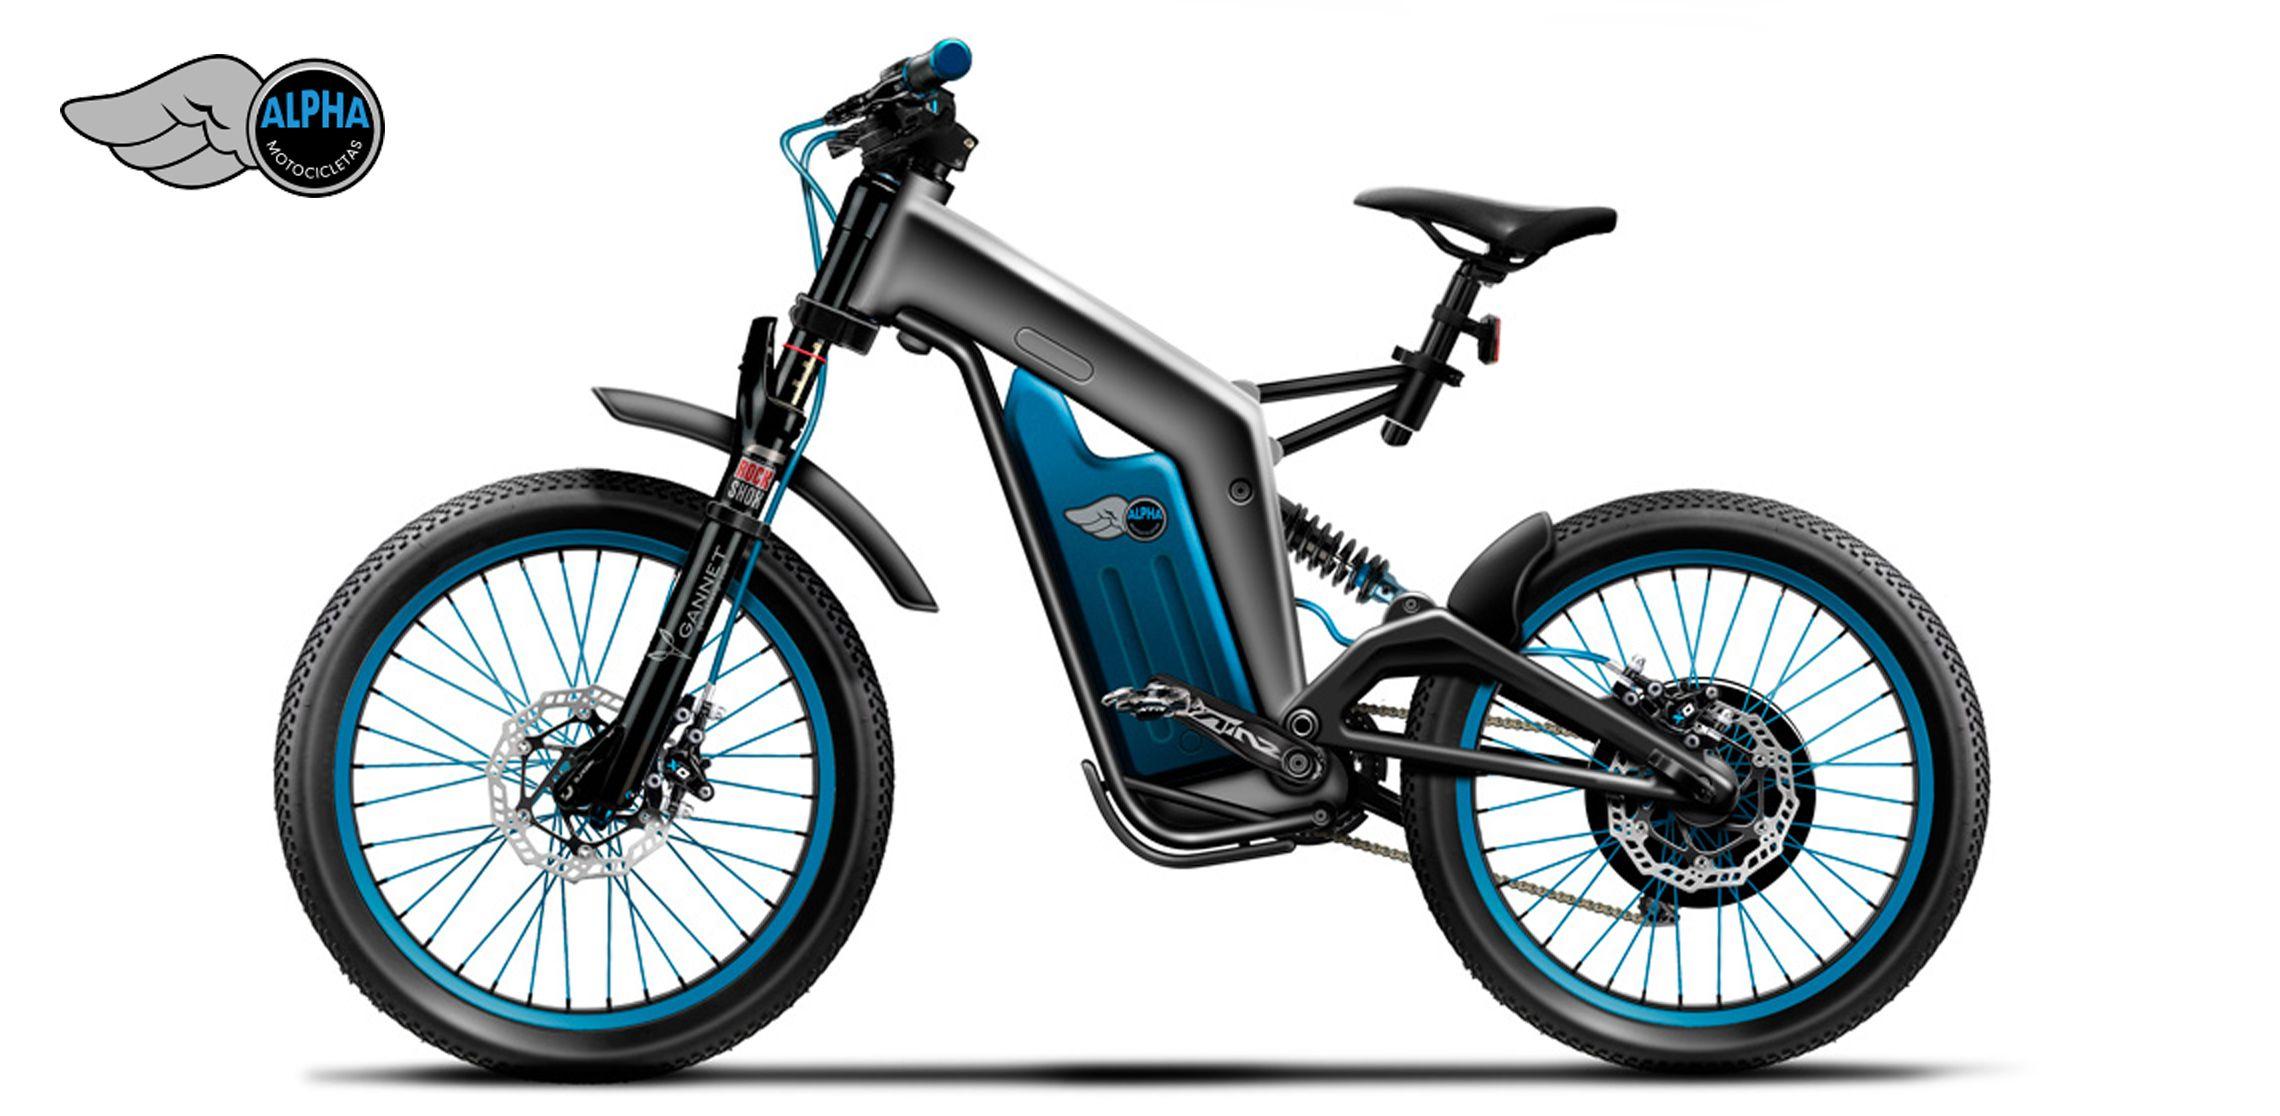 alpha wildcat 100 km h mit einem ebike 2 3 wheels big small elektro rad elektro. Black Bedroom Furniture Sets. Home Design Ideas